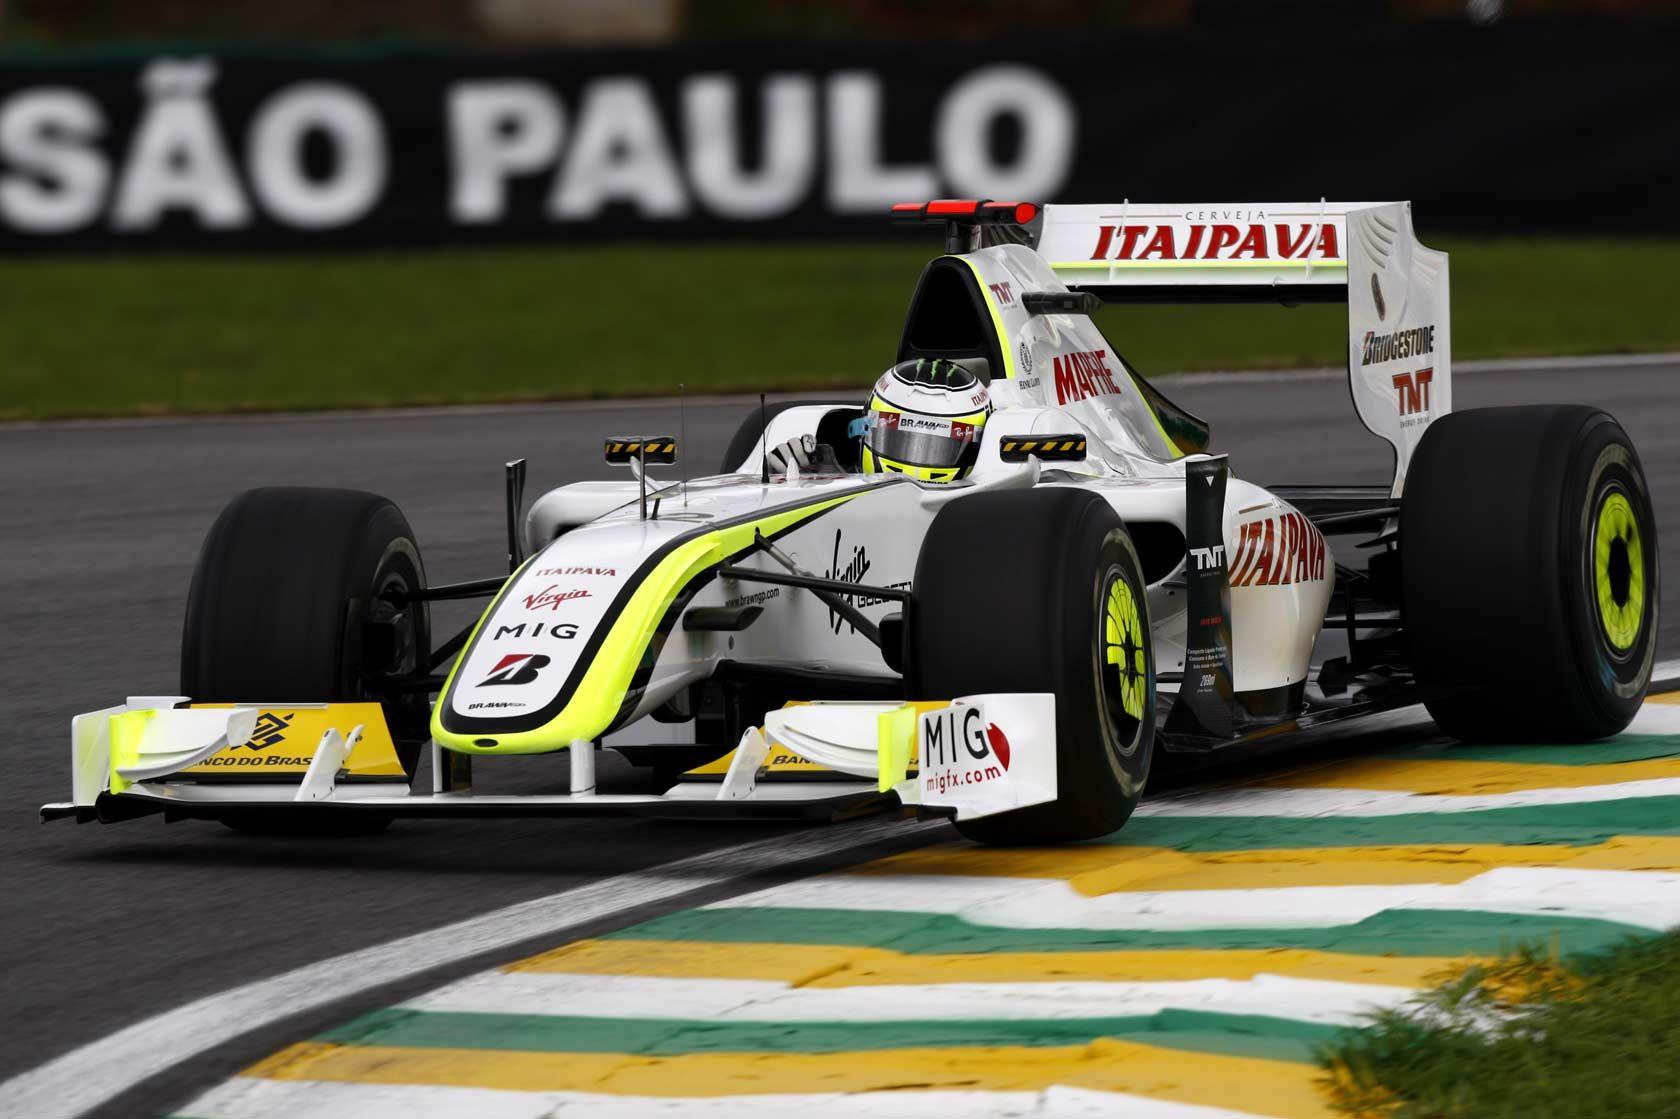 Jenson Button / Brawn BGP001 | Formula 1 car, Indy car racing, Brawn